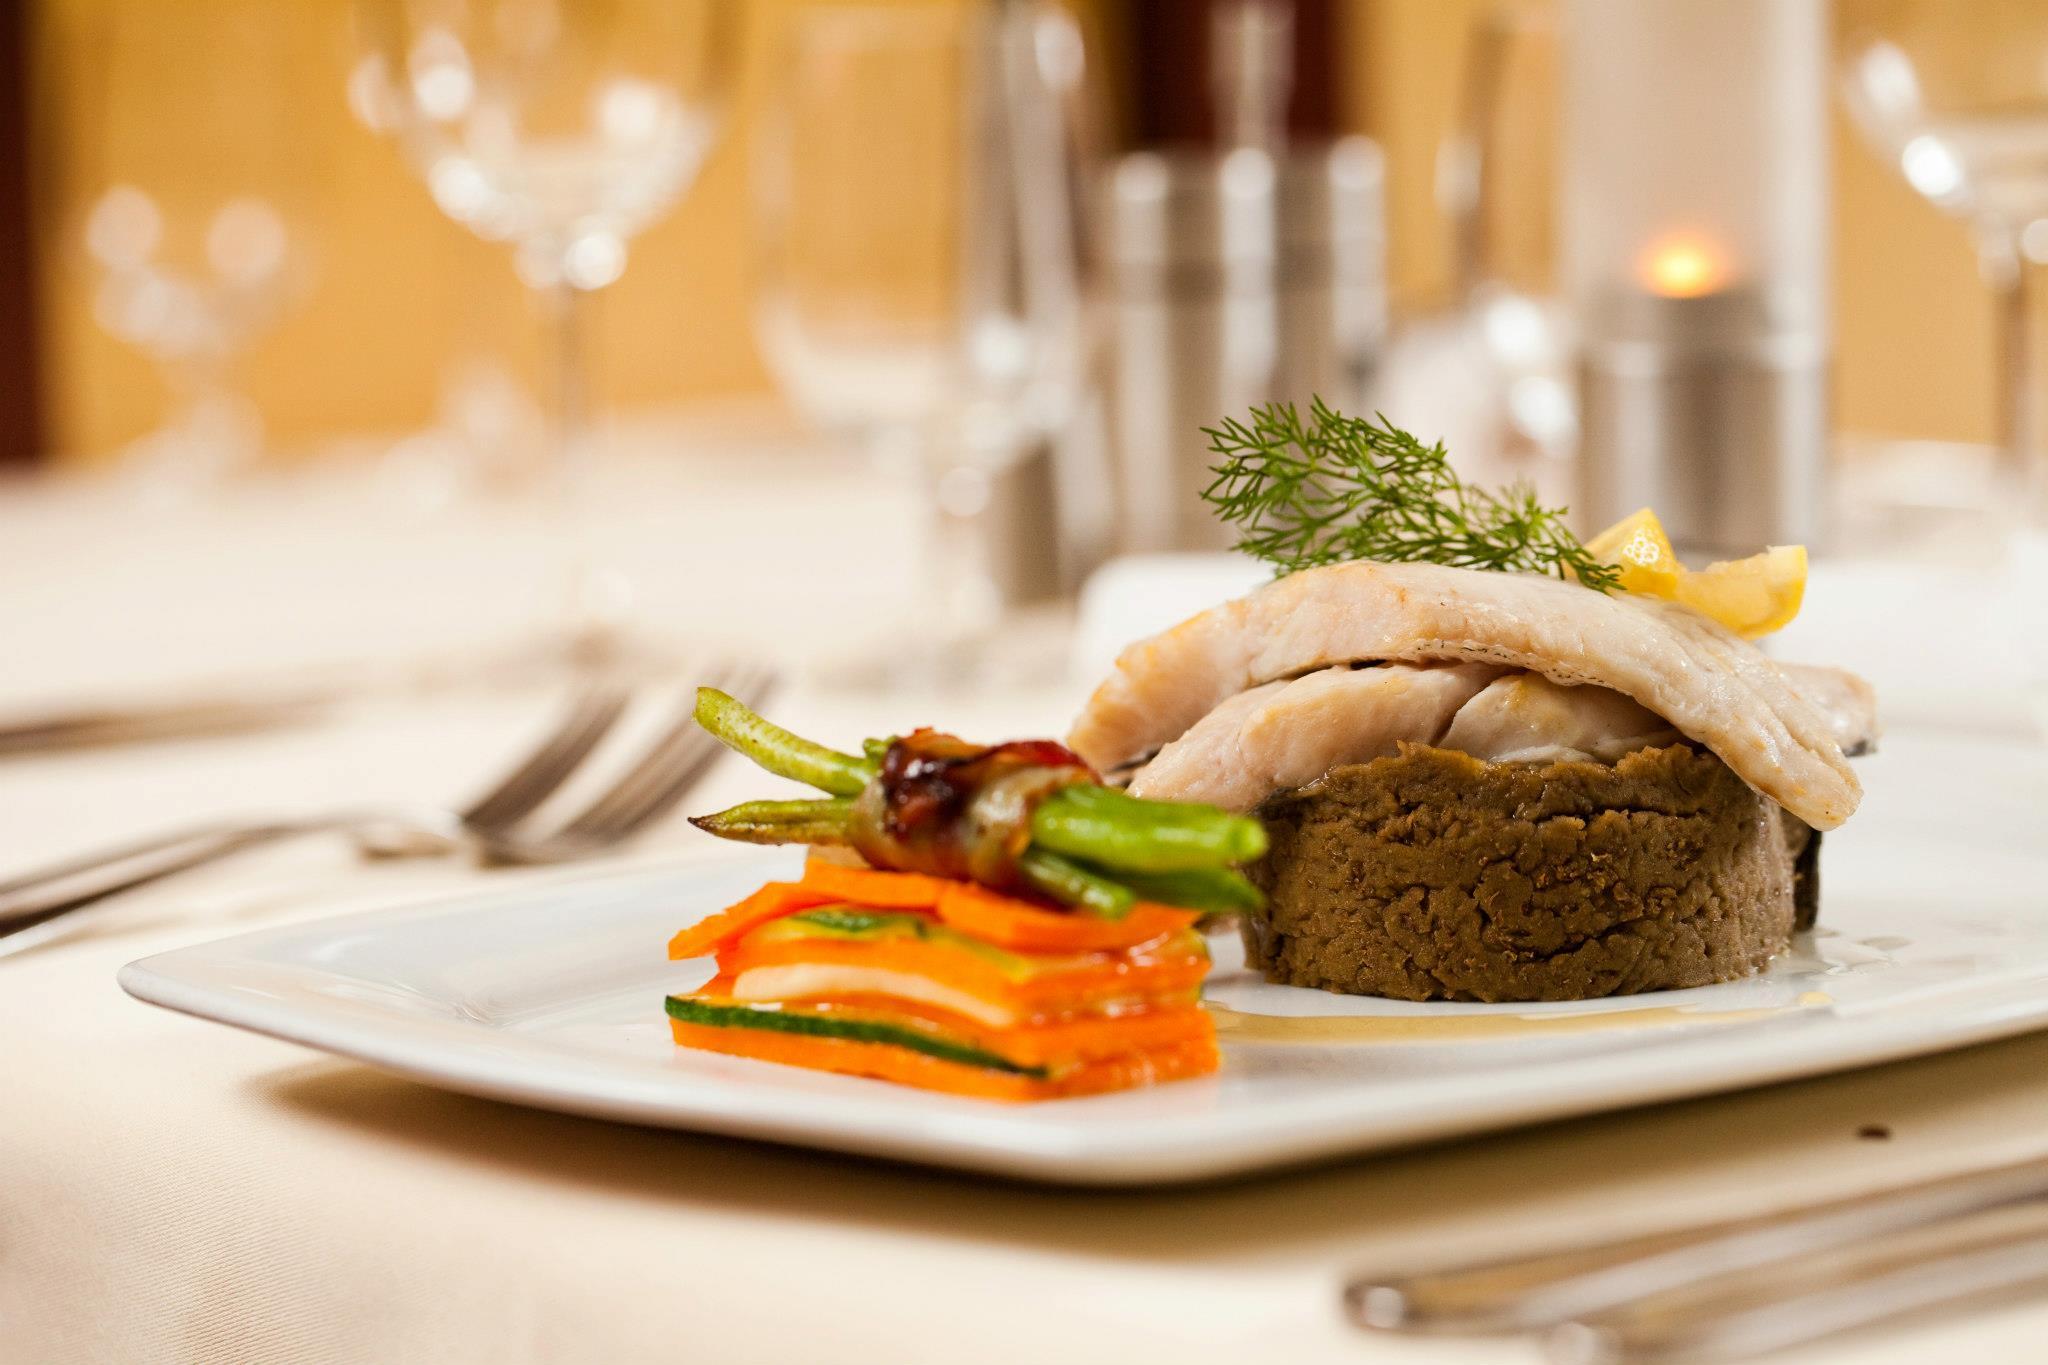 Jedlo - nafotenie obedového menu